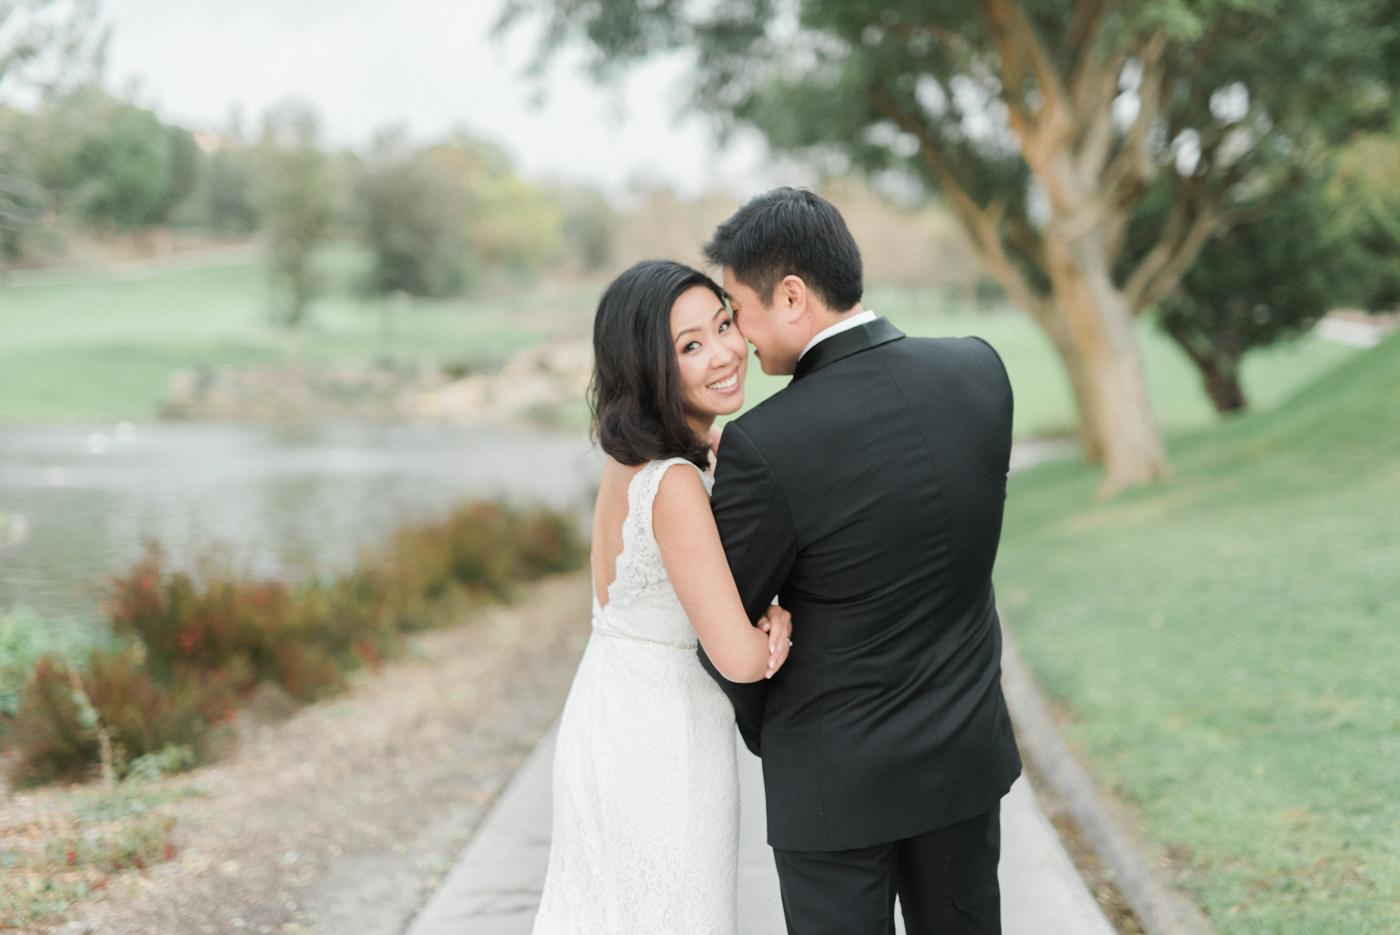 Friendly_Hills_Country_Club_fine_art_wedding_photographer_los_angeles_paris-8.jpg